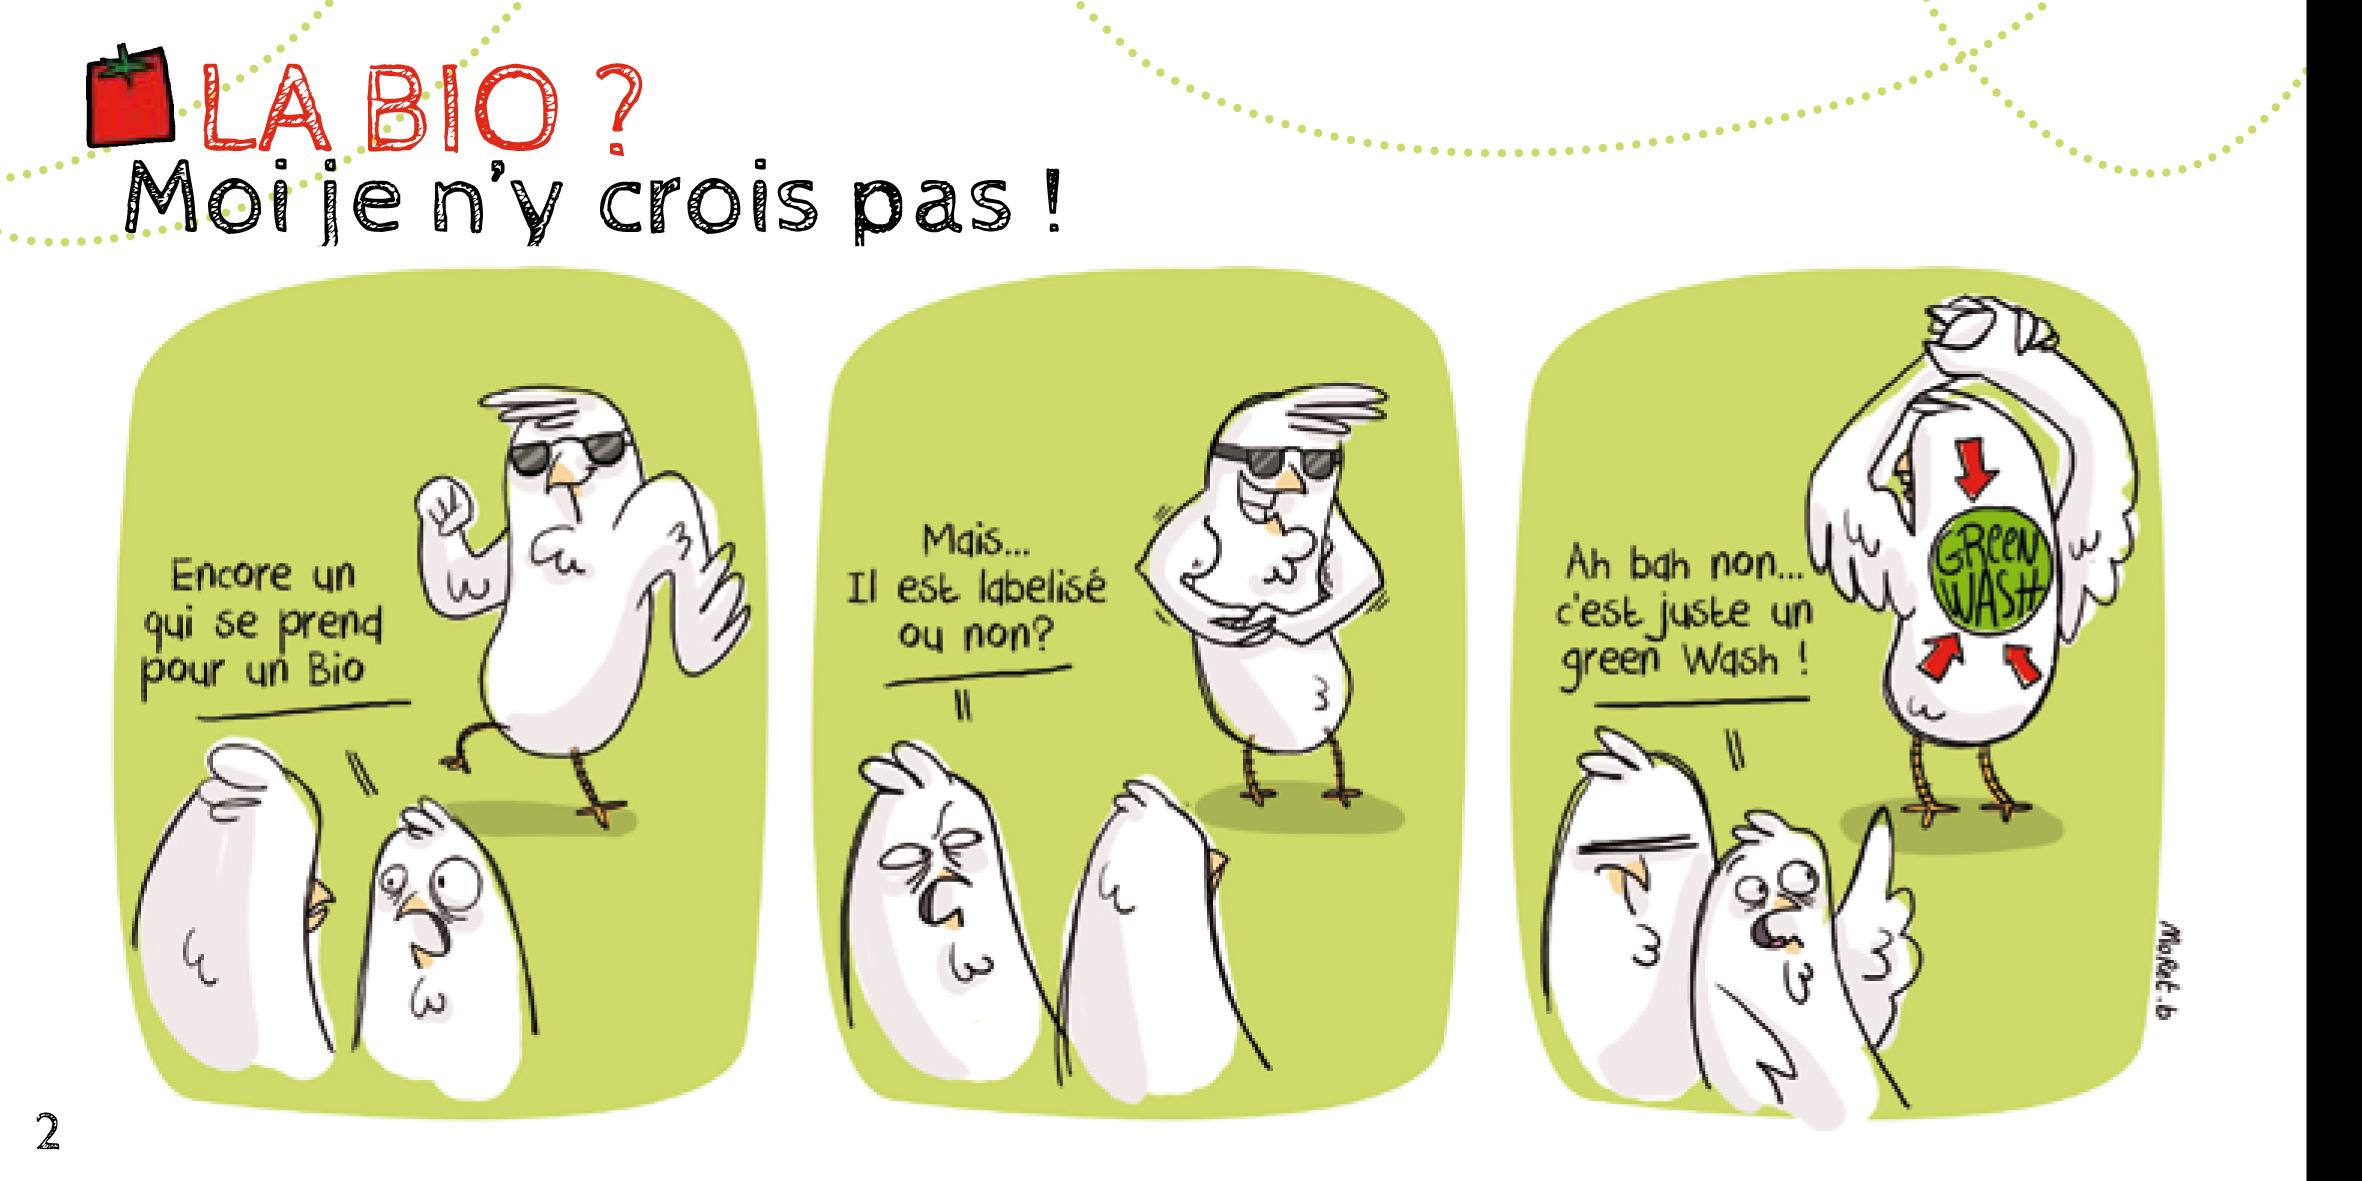 Panier Bio Pas Cher Montreal : Manger ? amap dijon les paniers d honor? panier bio